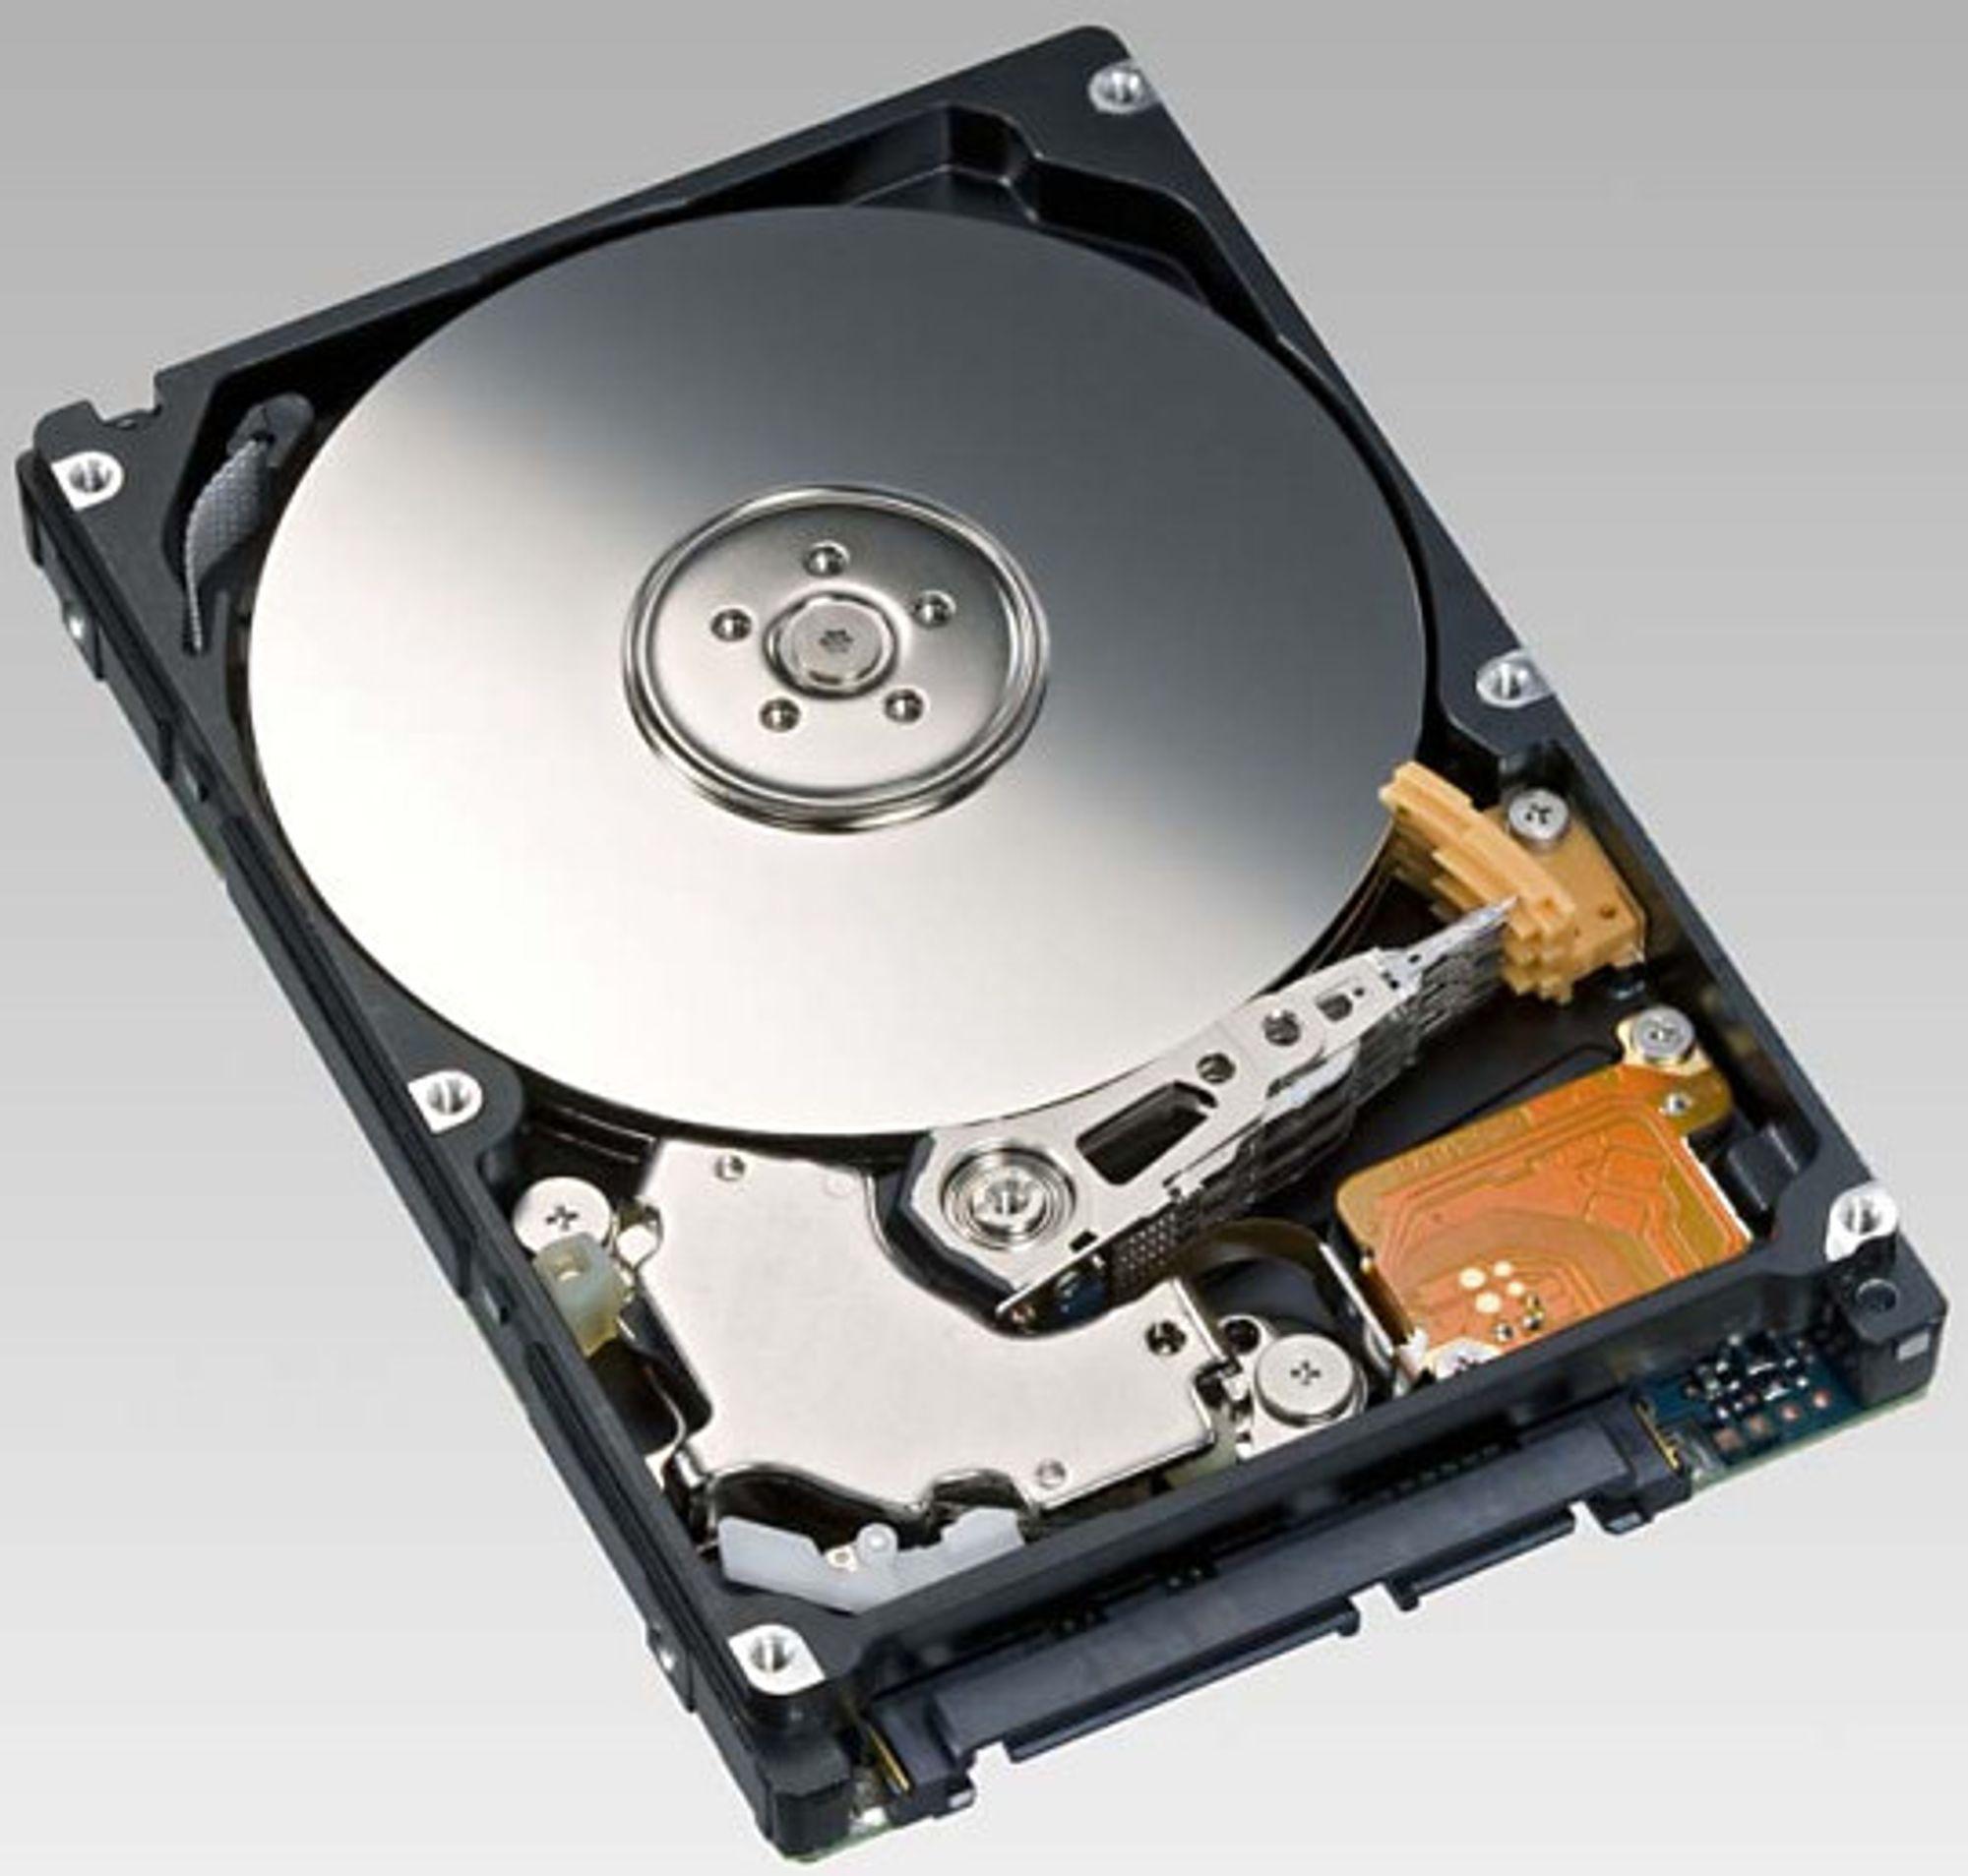 Opptil 500 GB kapasitet: Fujitsu MHZ2 BT